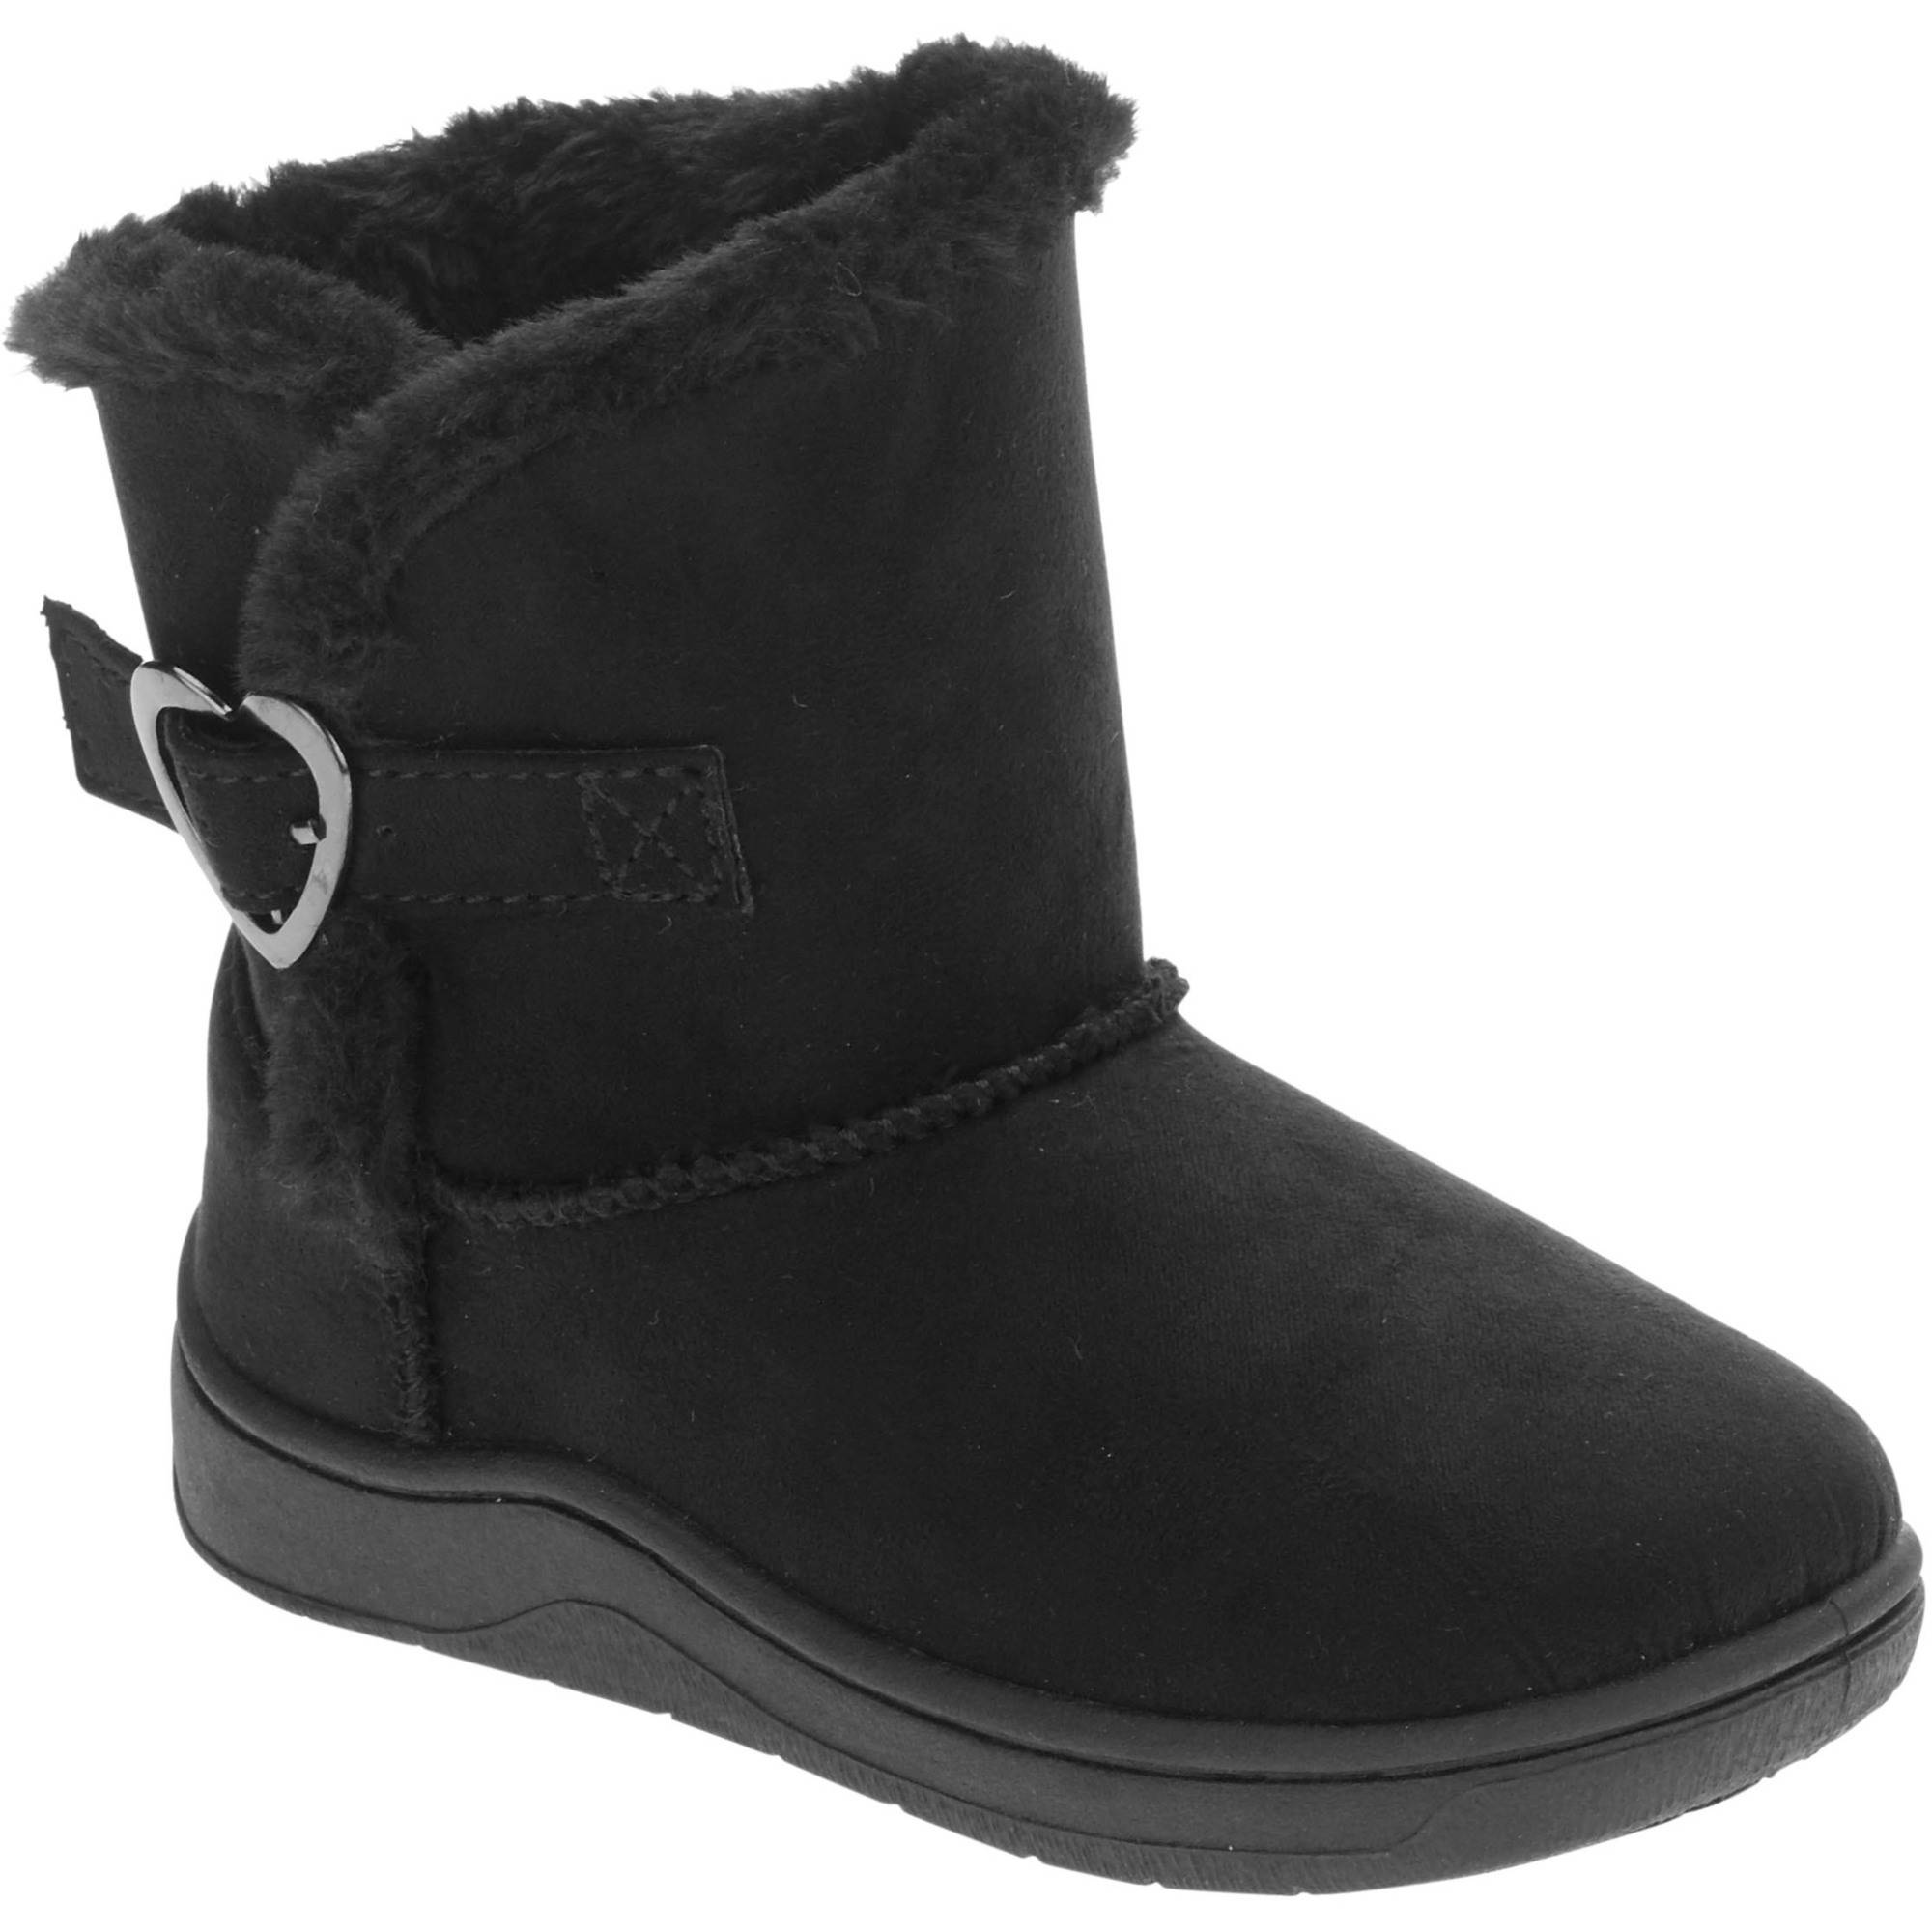 Garanimals Infant Girls Shearling Boot